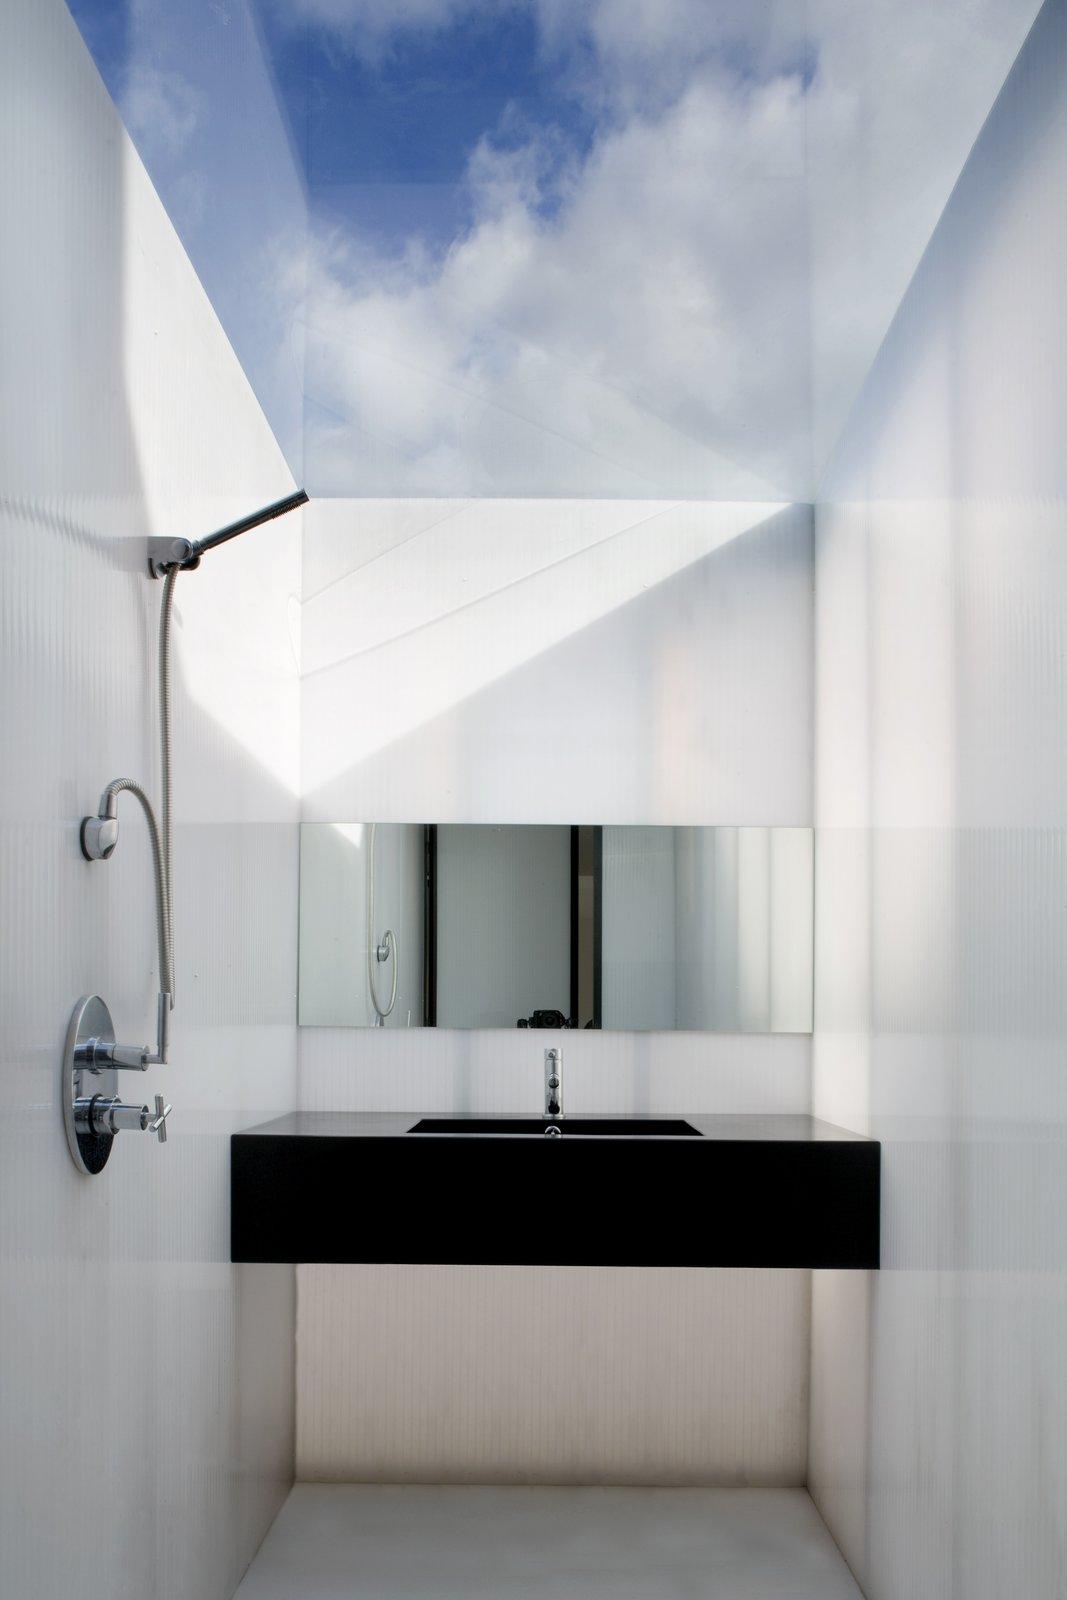 Bathroom  Plastic House by Urban-Agency Architects